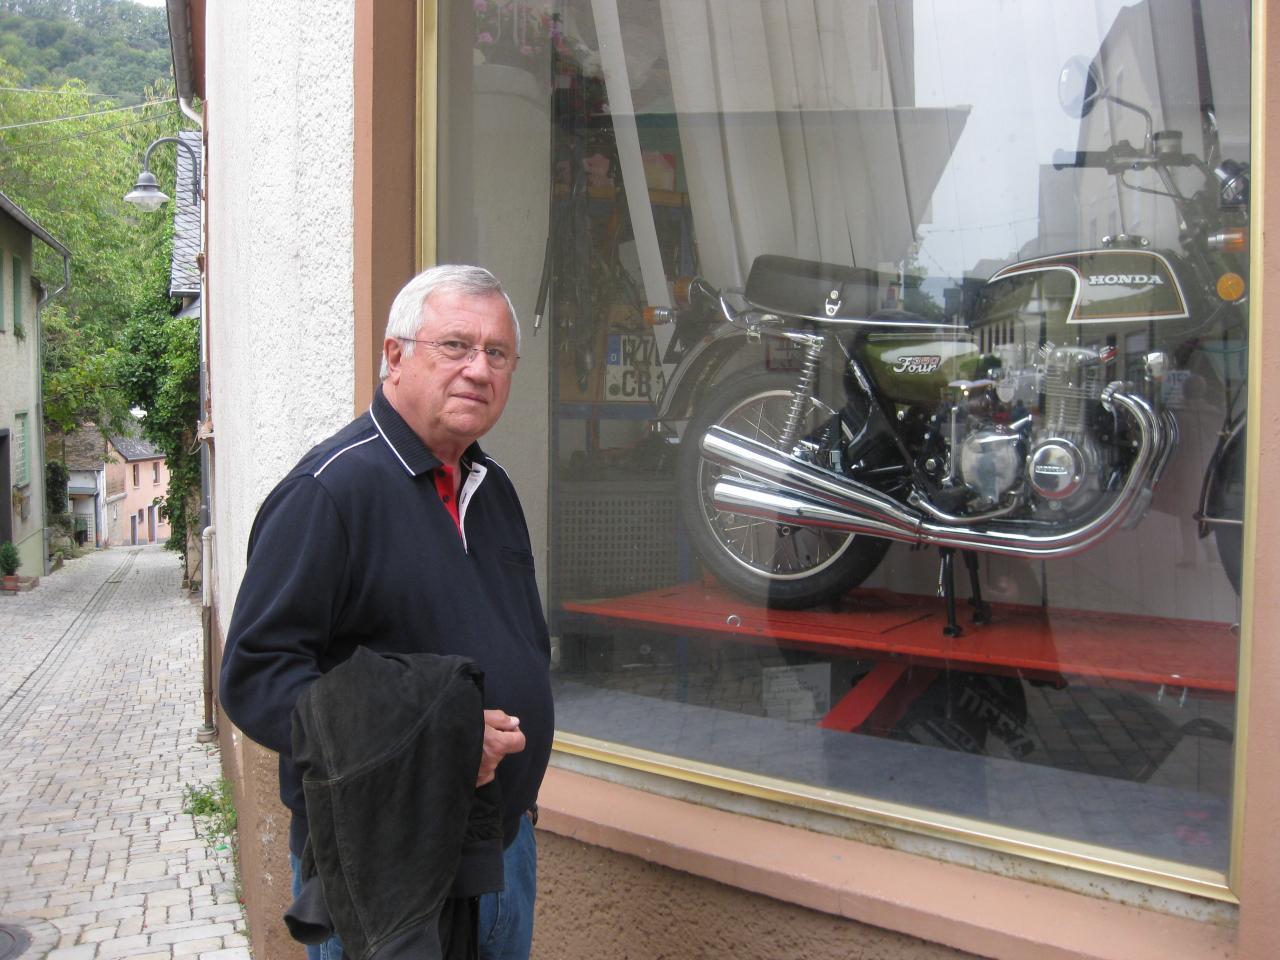 GEORG EN ADMIRATION DEVANT UNE MOTO